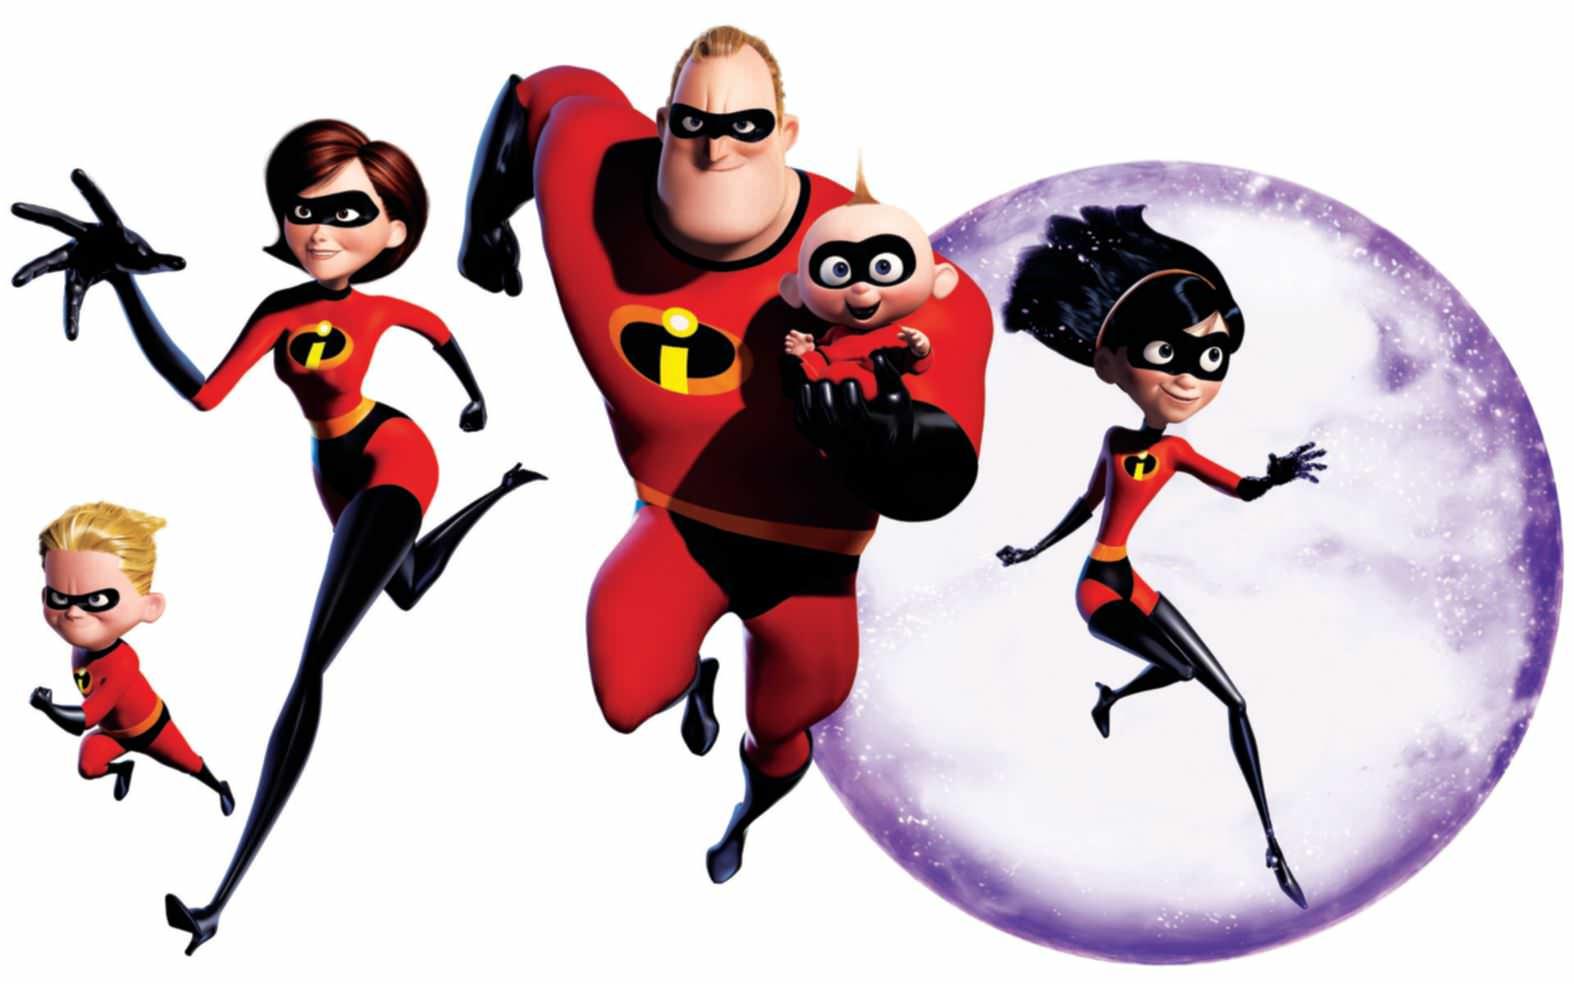 top 10 les indestructible pixar disney my geek actu.jpg